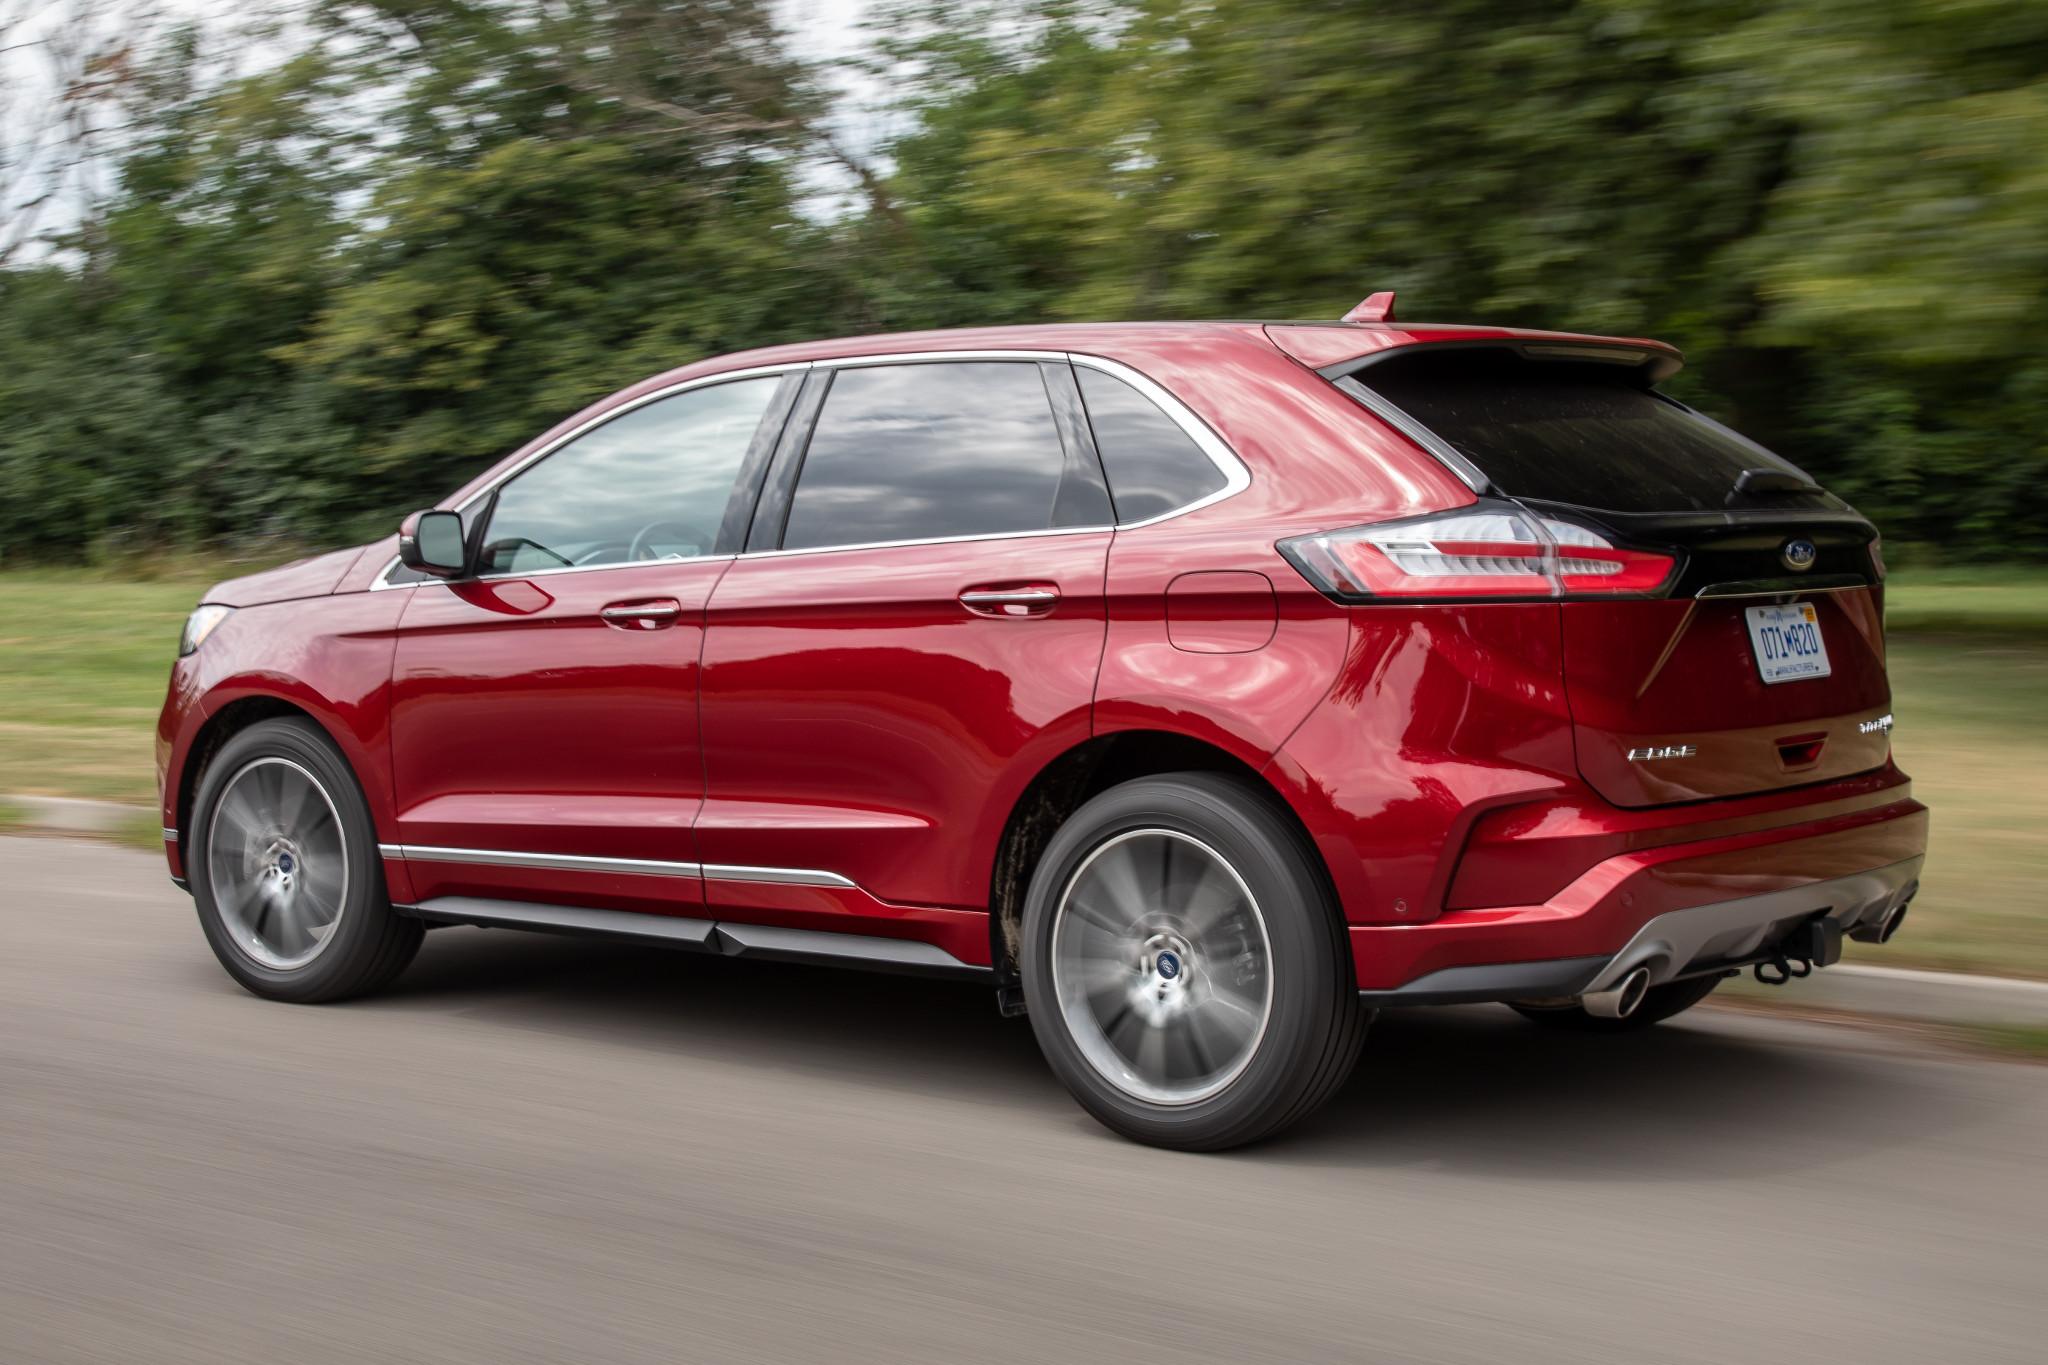 ford-edge-titanium-awd-2019-03-angle--exterior--red.jpg